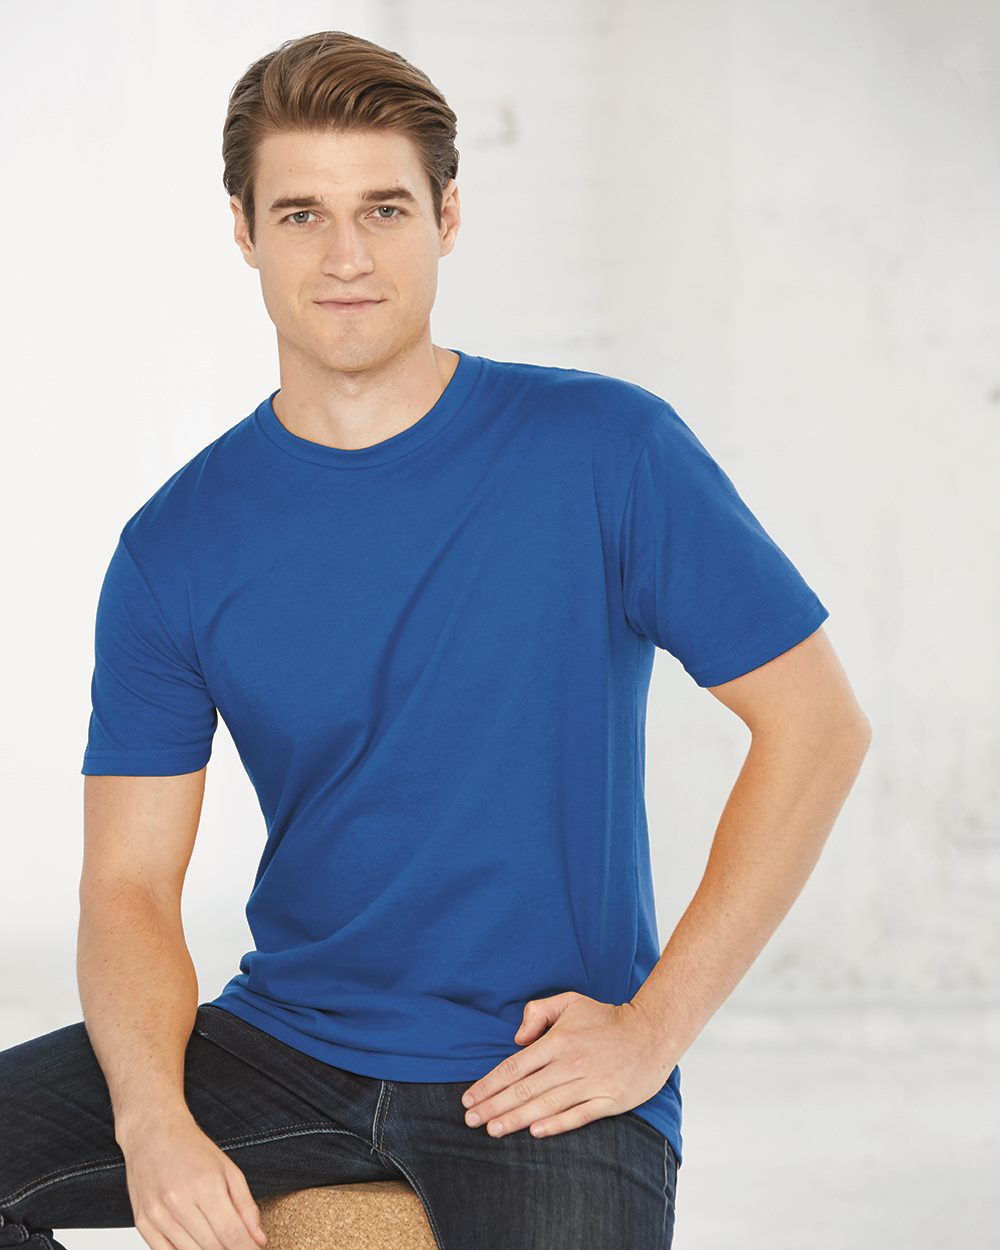 Bayside 2905 Union Made Short Sleeve T-Shirt